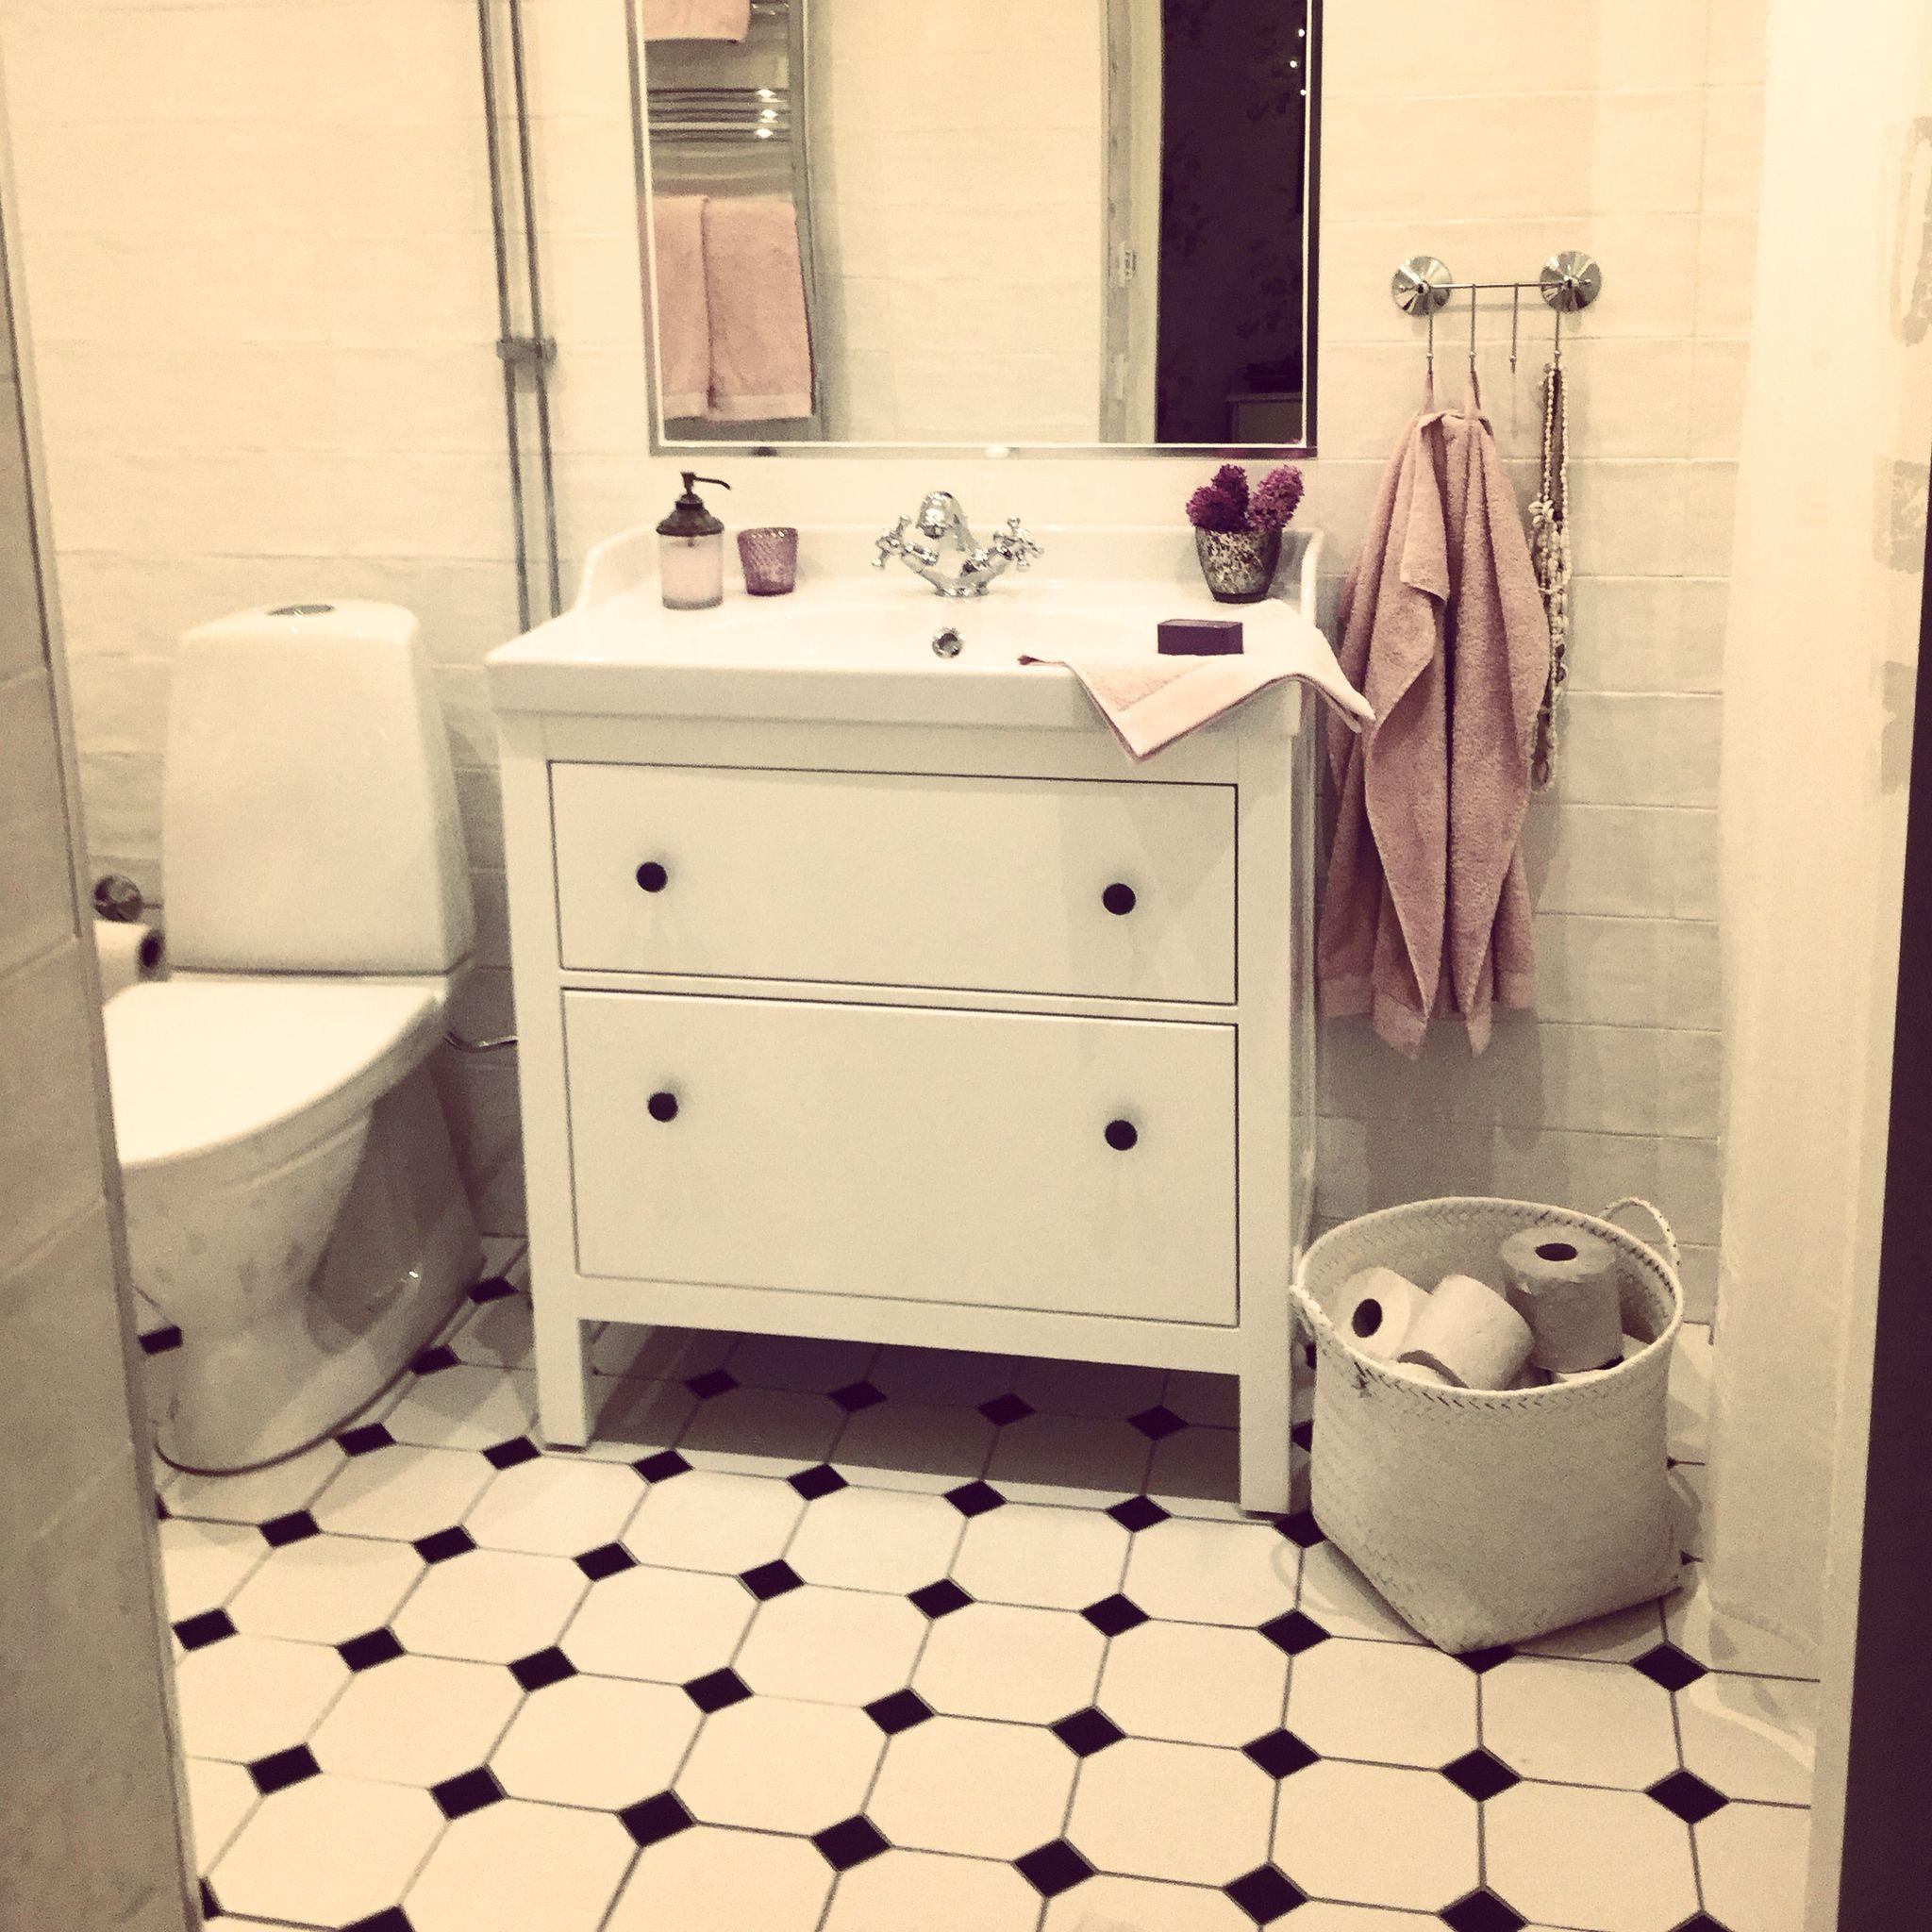 Pin By Stephanie Gleeson On Toiletd: Pin By Stephanie Alley On Bathroom